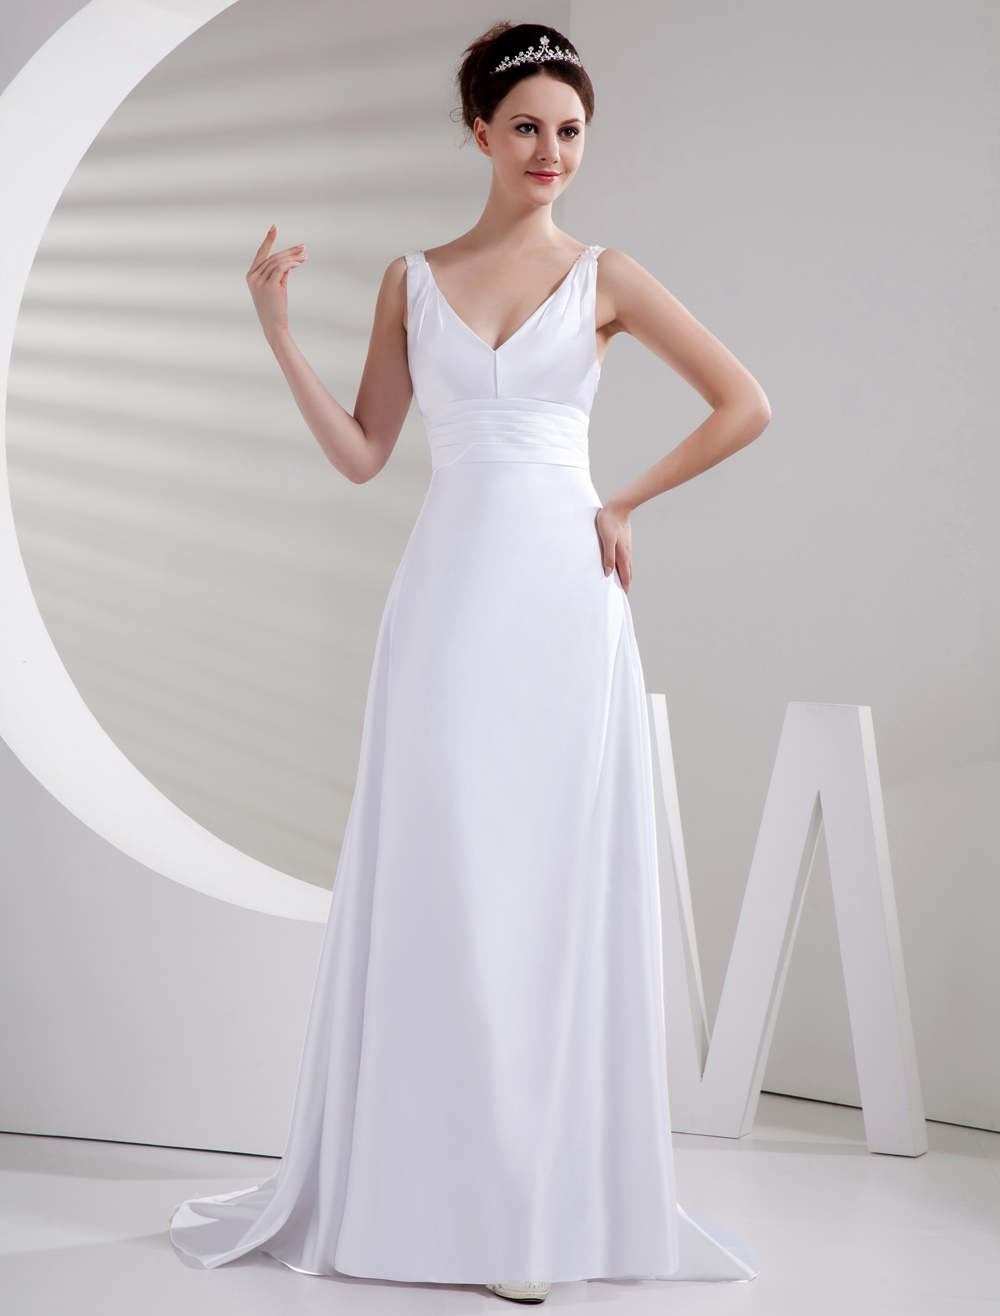 Charming White Sweep Evening Dress with V-Neck A-line Sleeveless Satin (Wedding Evening Dresses) photo